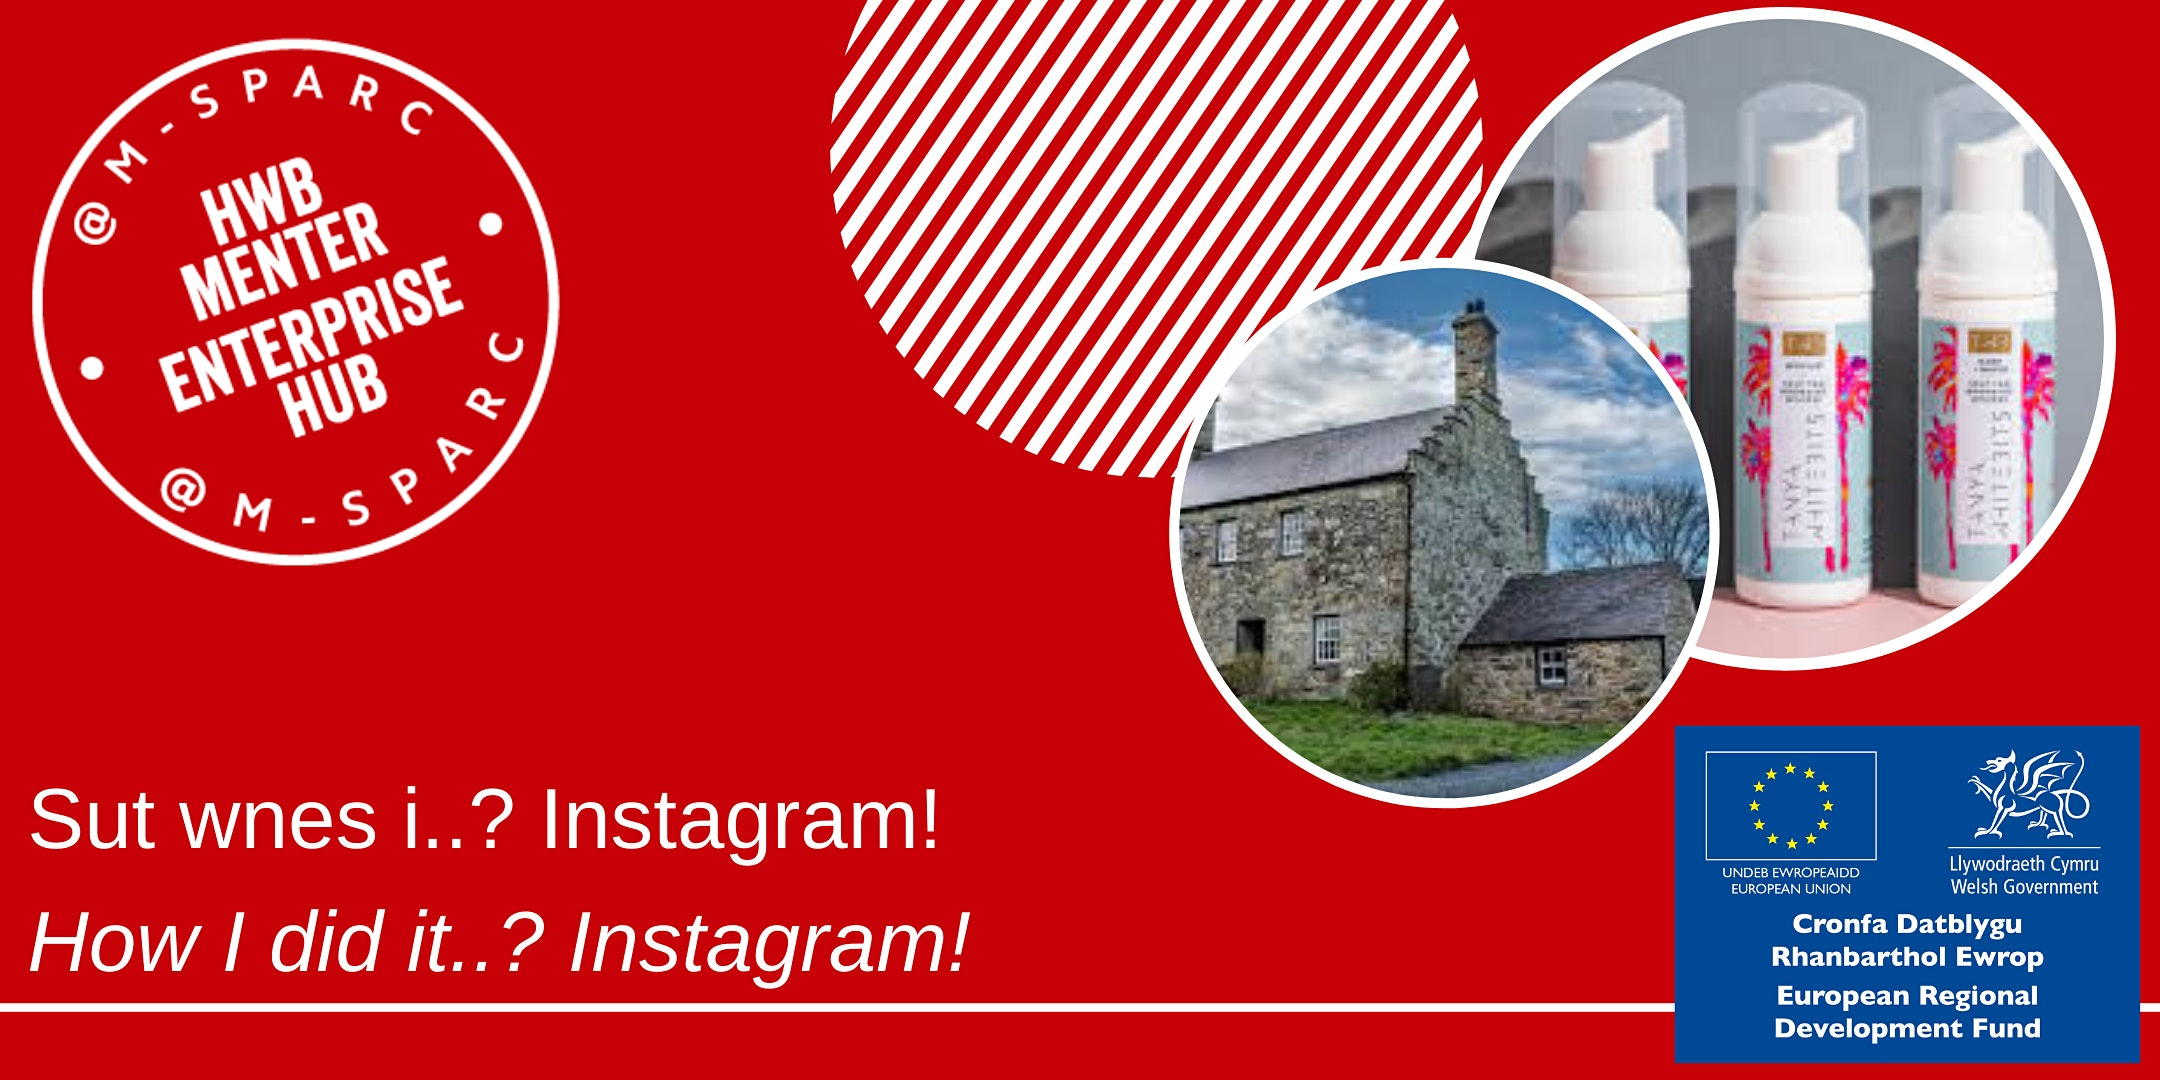 Sut wnes i...Instagram!  How I did it...Instagram!